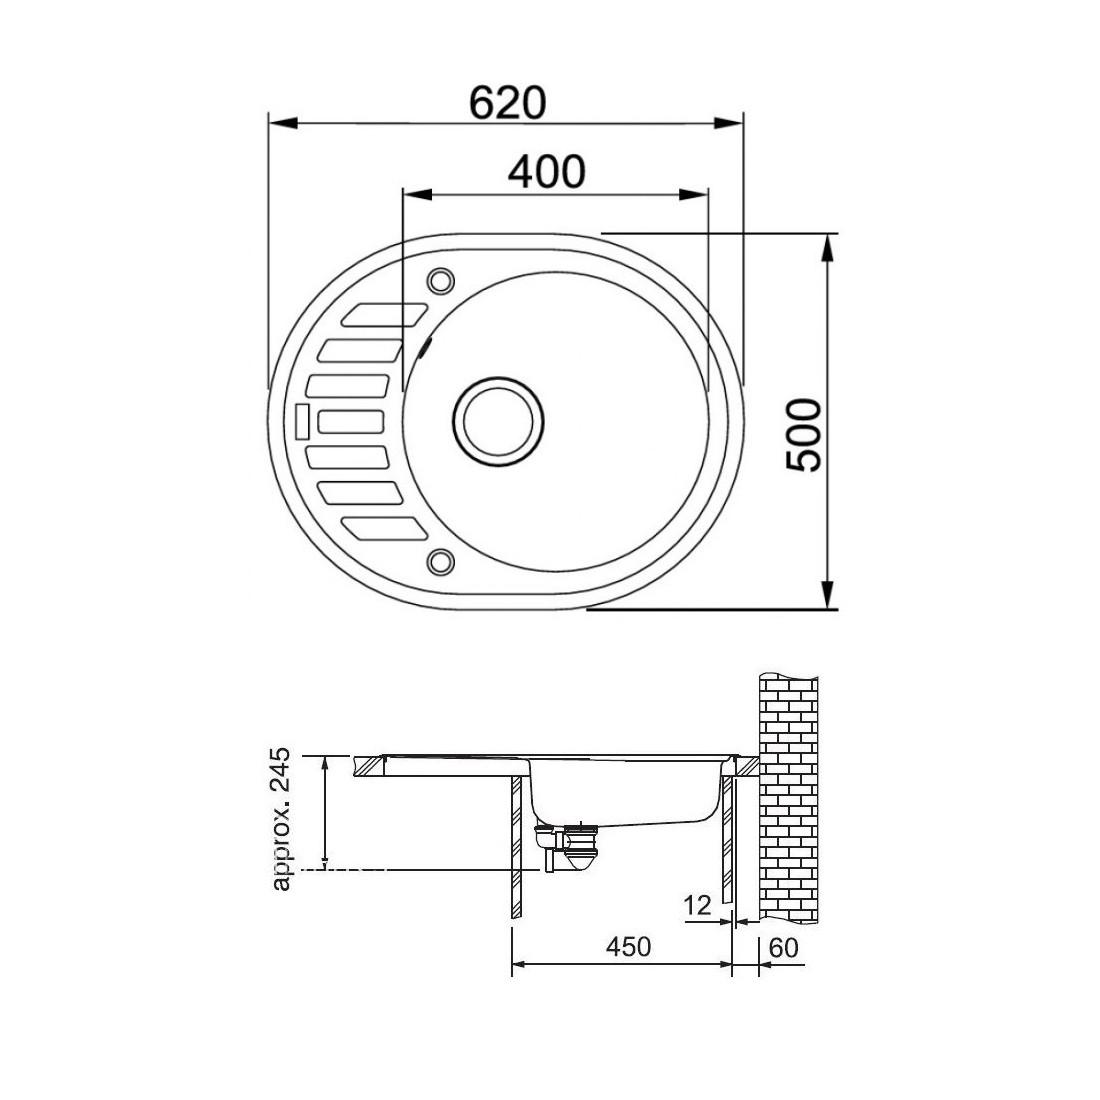 Akmens masės plautuvė Franke Ronda ROG 611-62, ekscentrinis ventilis, Sachara